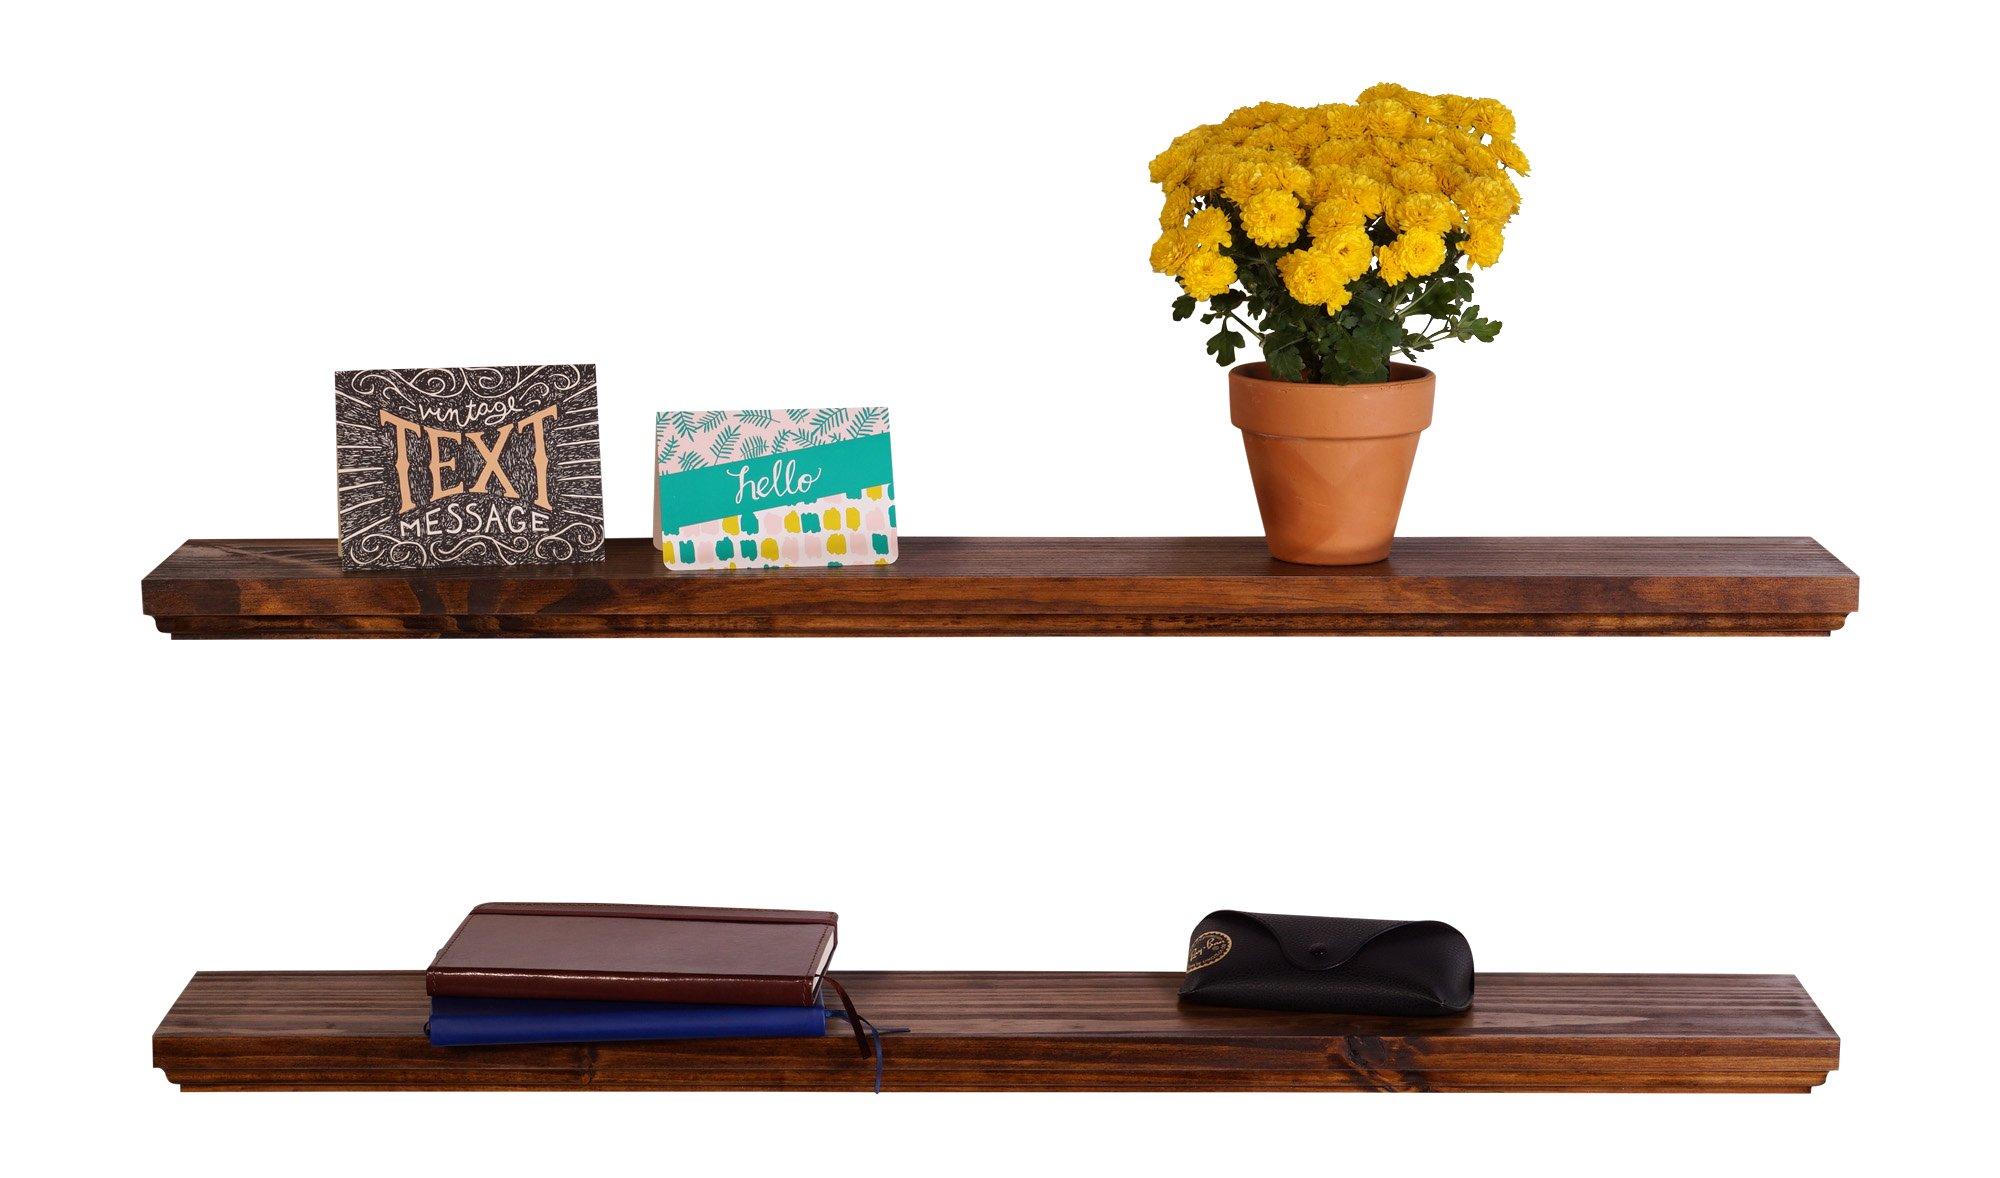 DAKODA LOVE Routed Edge Floating Shelves, USA Handmade, Clear Coat Finish, 100% Countersunk Hidden Floating Shelf Brackets, Beautiful Grain Pine Wood Wall Decor (Set of 2) (36'', Bourbon)